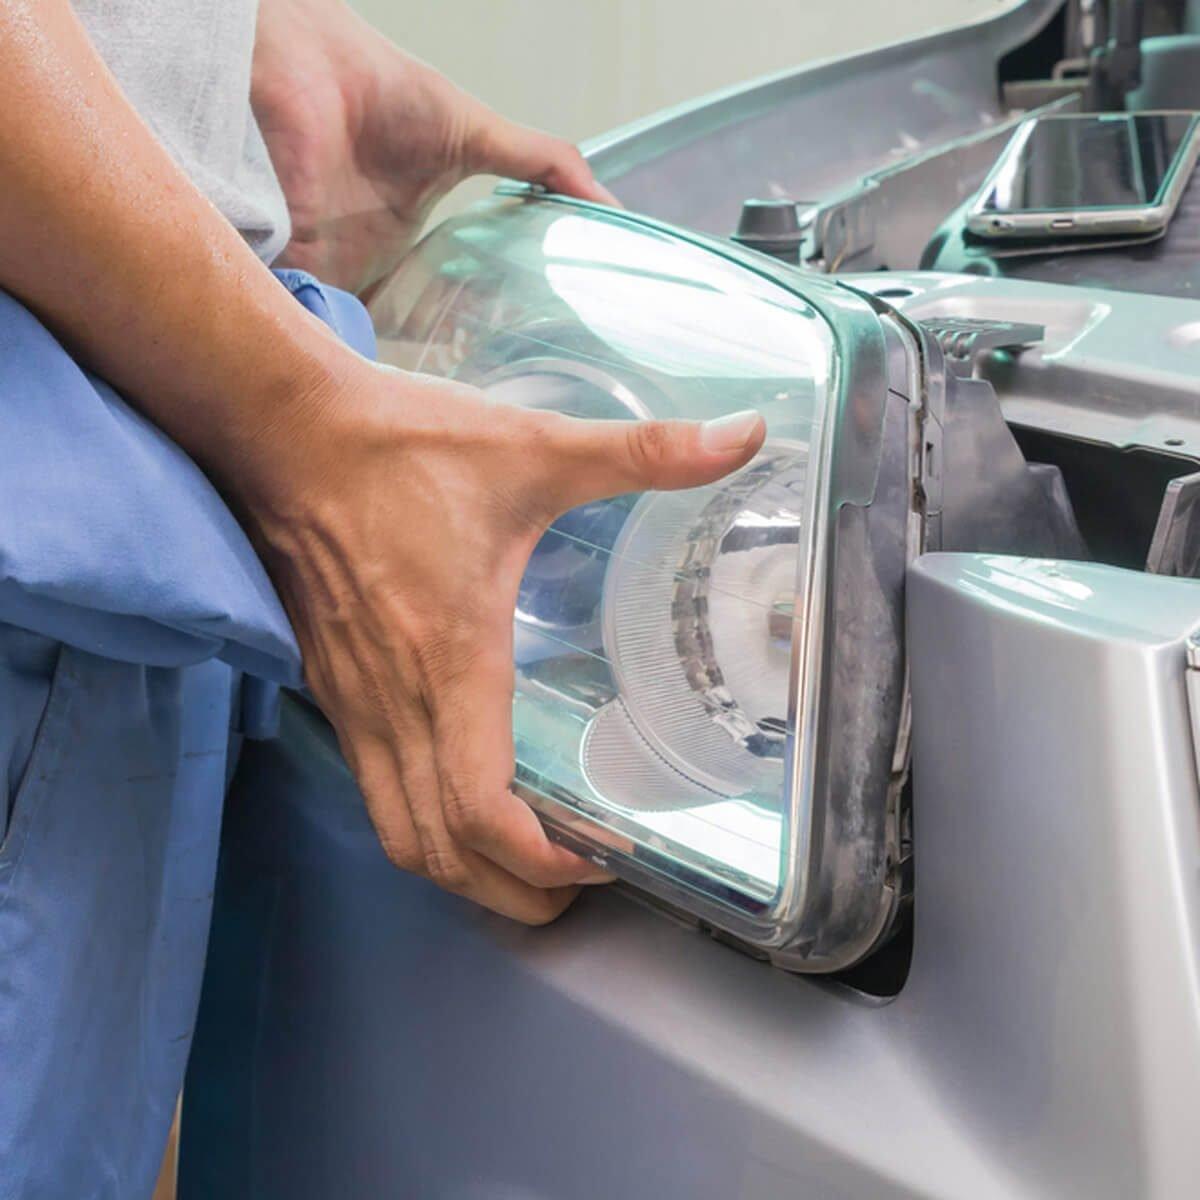 18 Car Maintenance Tasks to Do in Fall